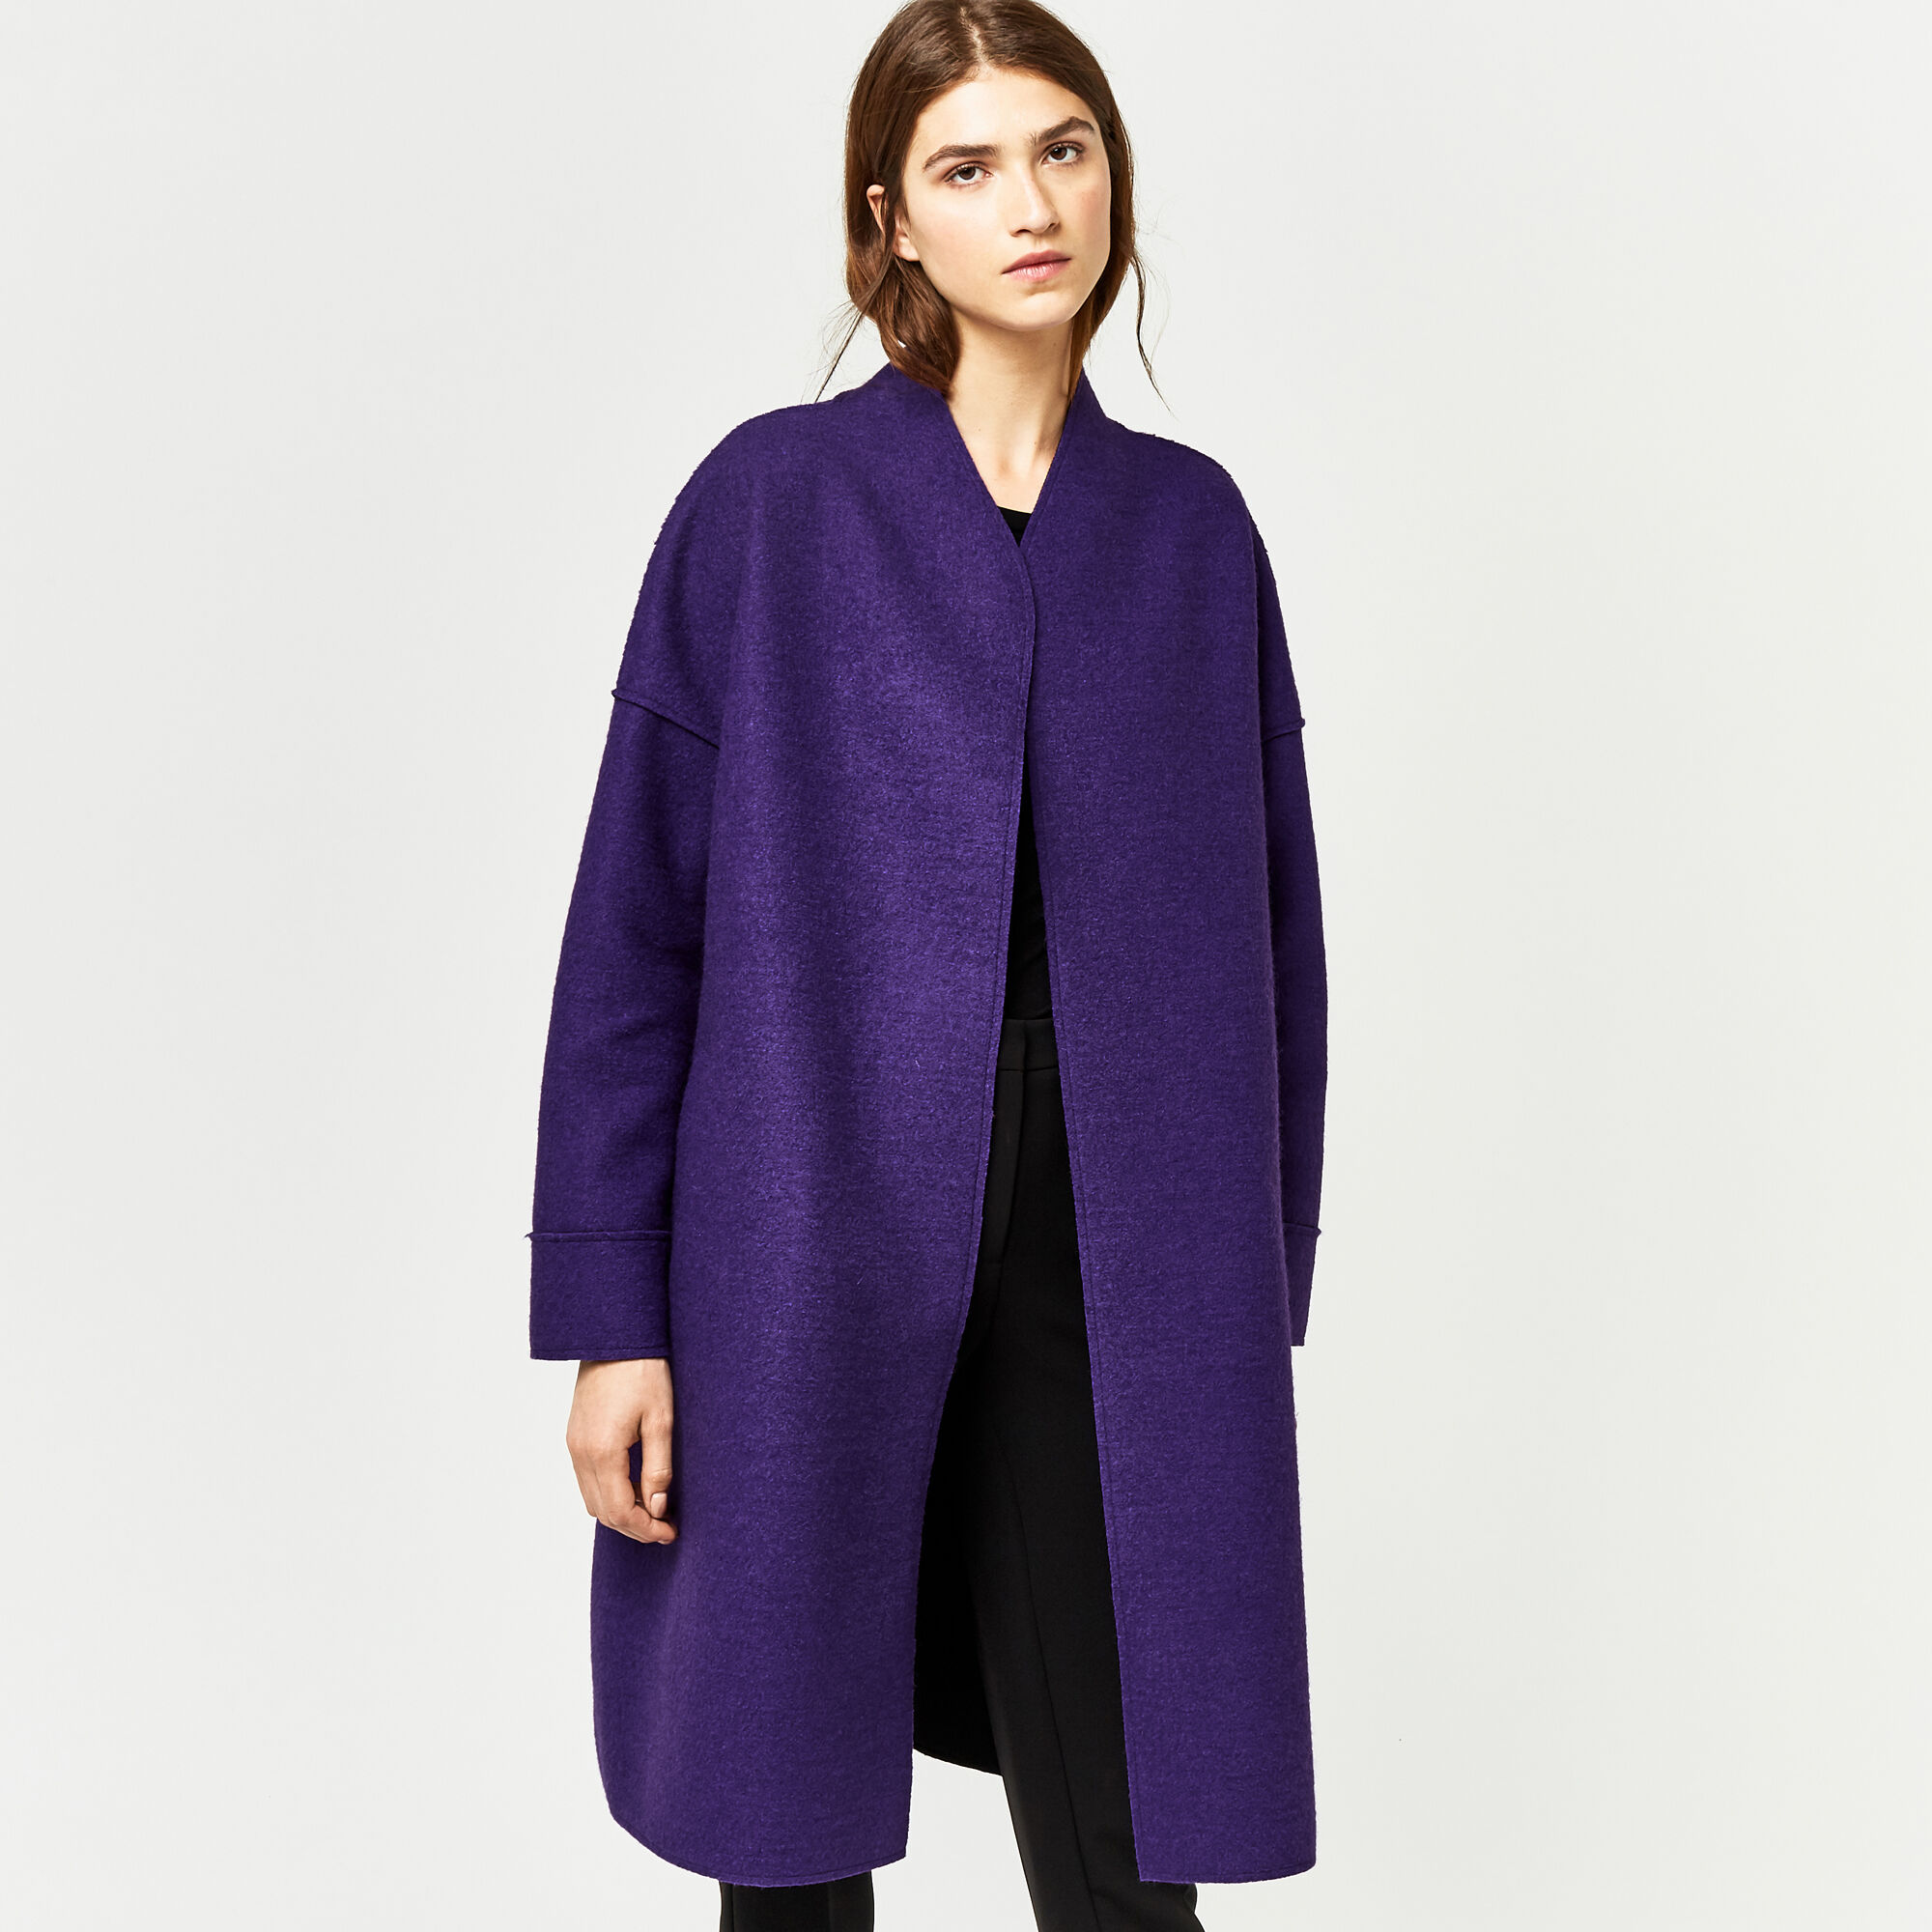 Warehouse, BONDED SWING COAT Dark Purple 1